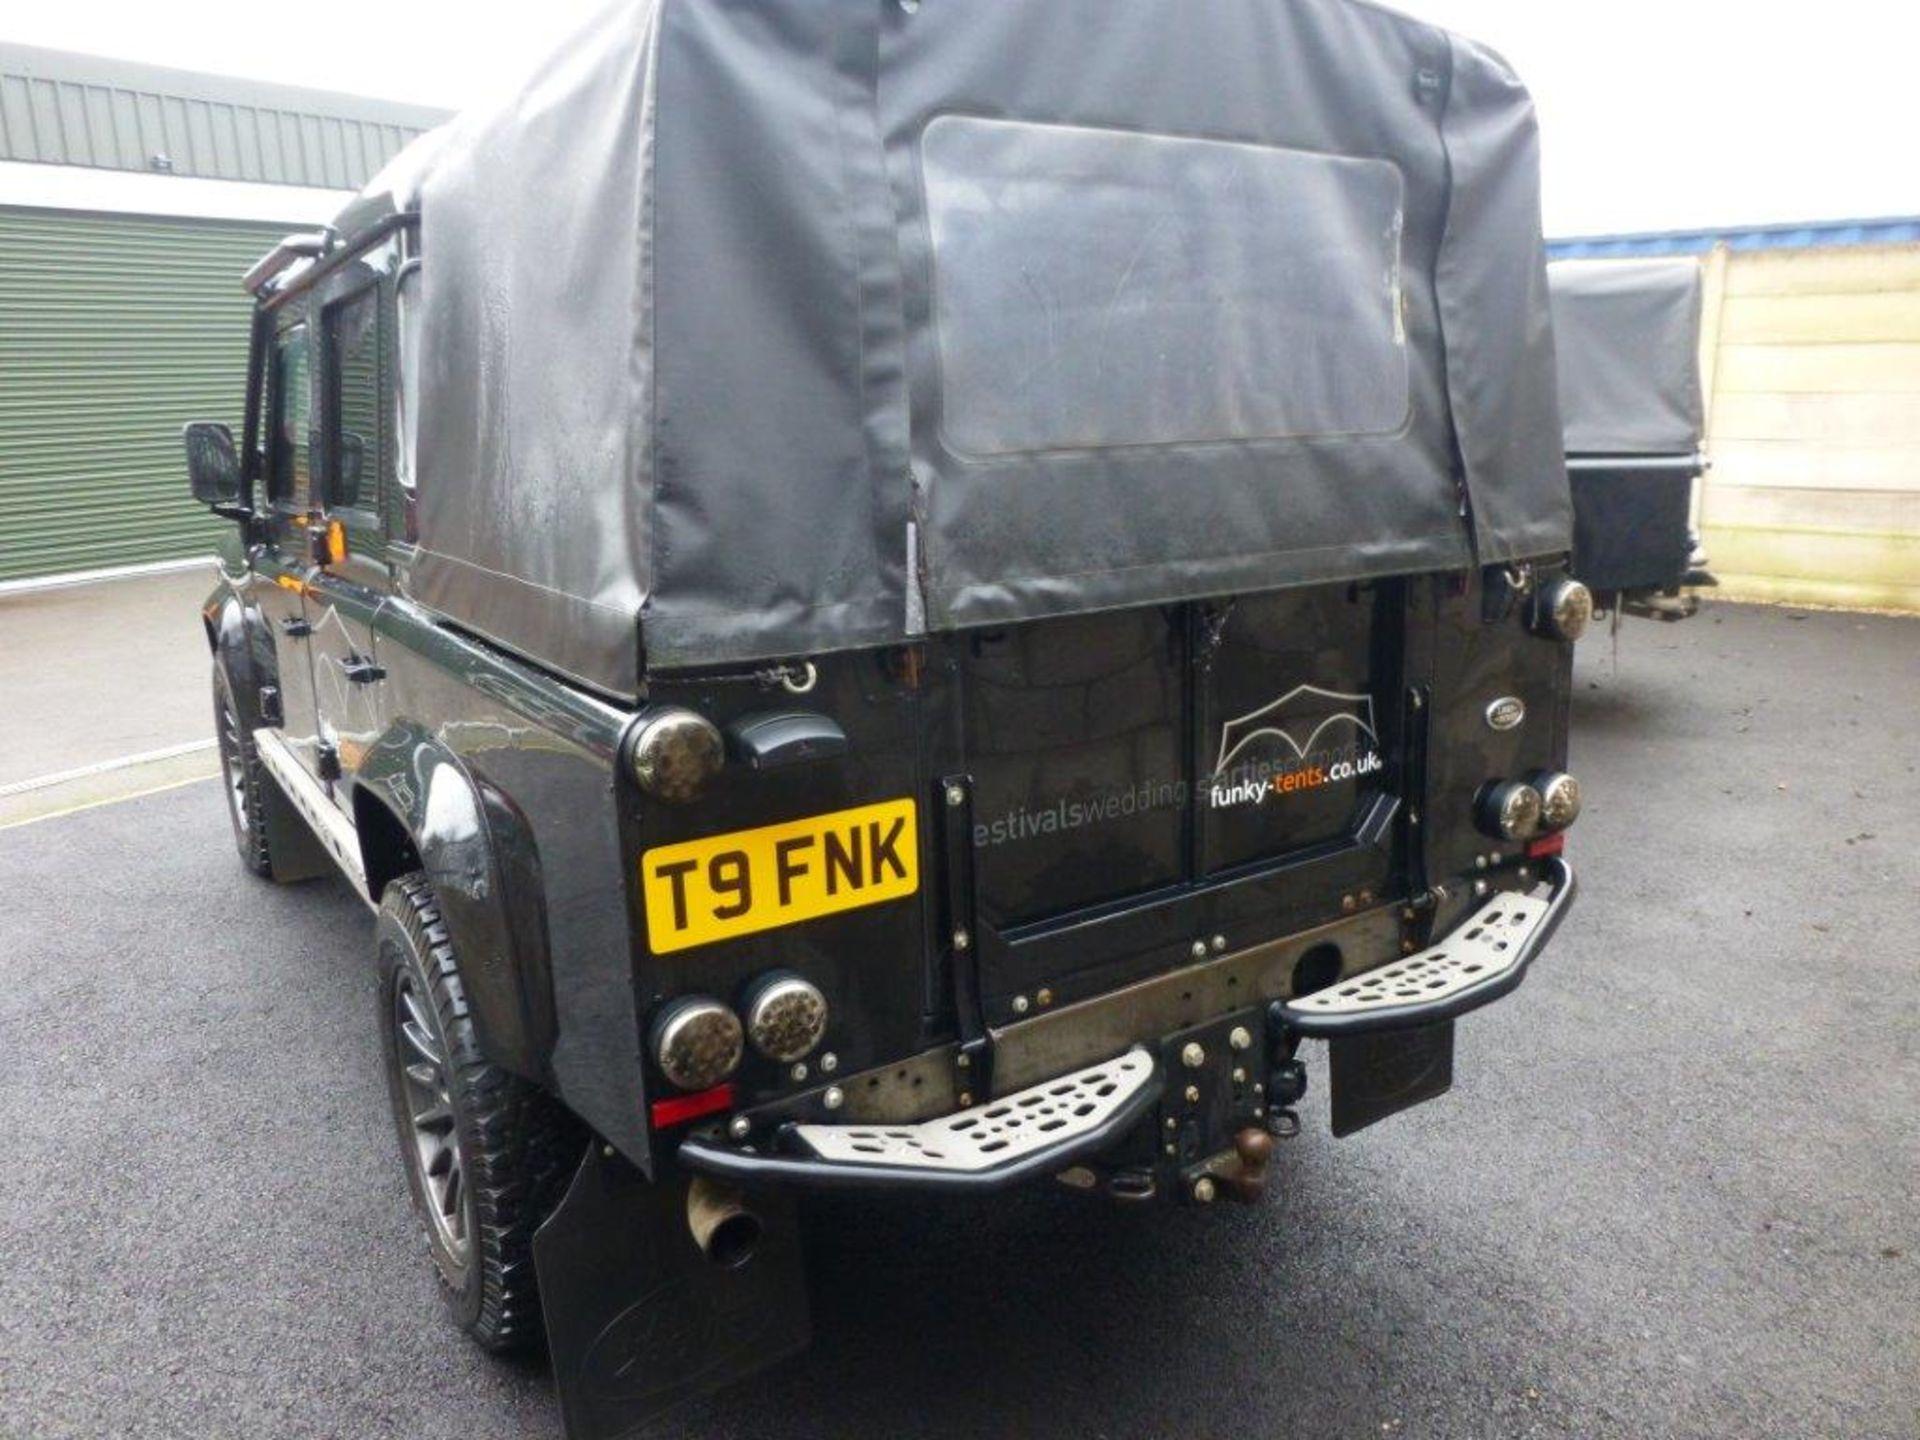 Land Rover Defender 110 XS Bowler double cab pickup TDCi (2.2). Reg no. T9 FNK. Reg. date 23/03/ - Image 6 of 13